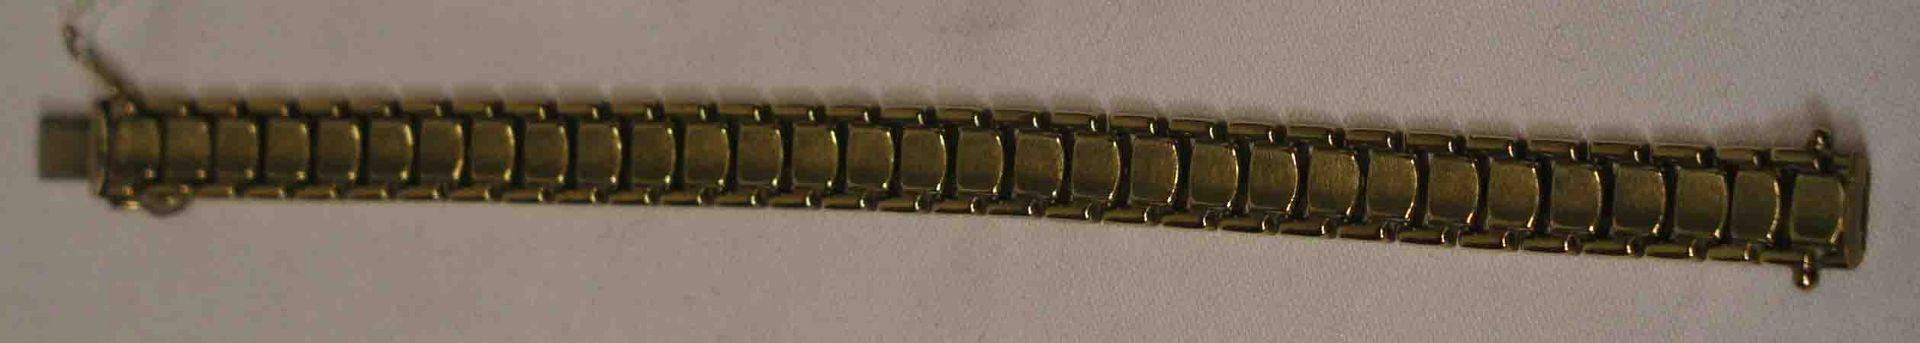 Armband. 8 Kt. Gold. Länge: 18,3cm.